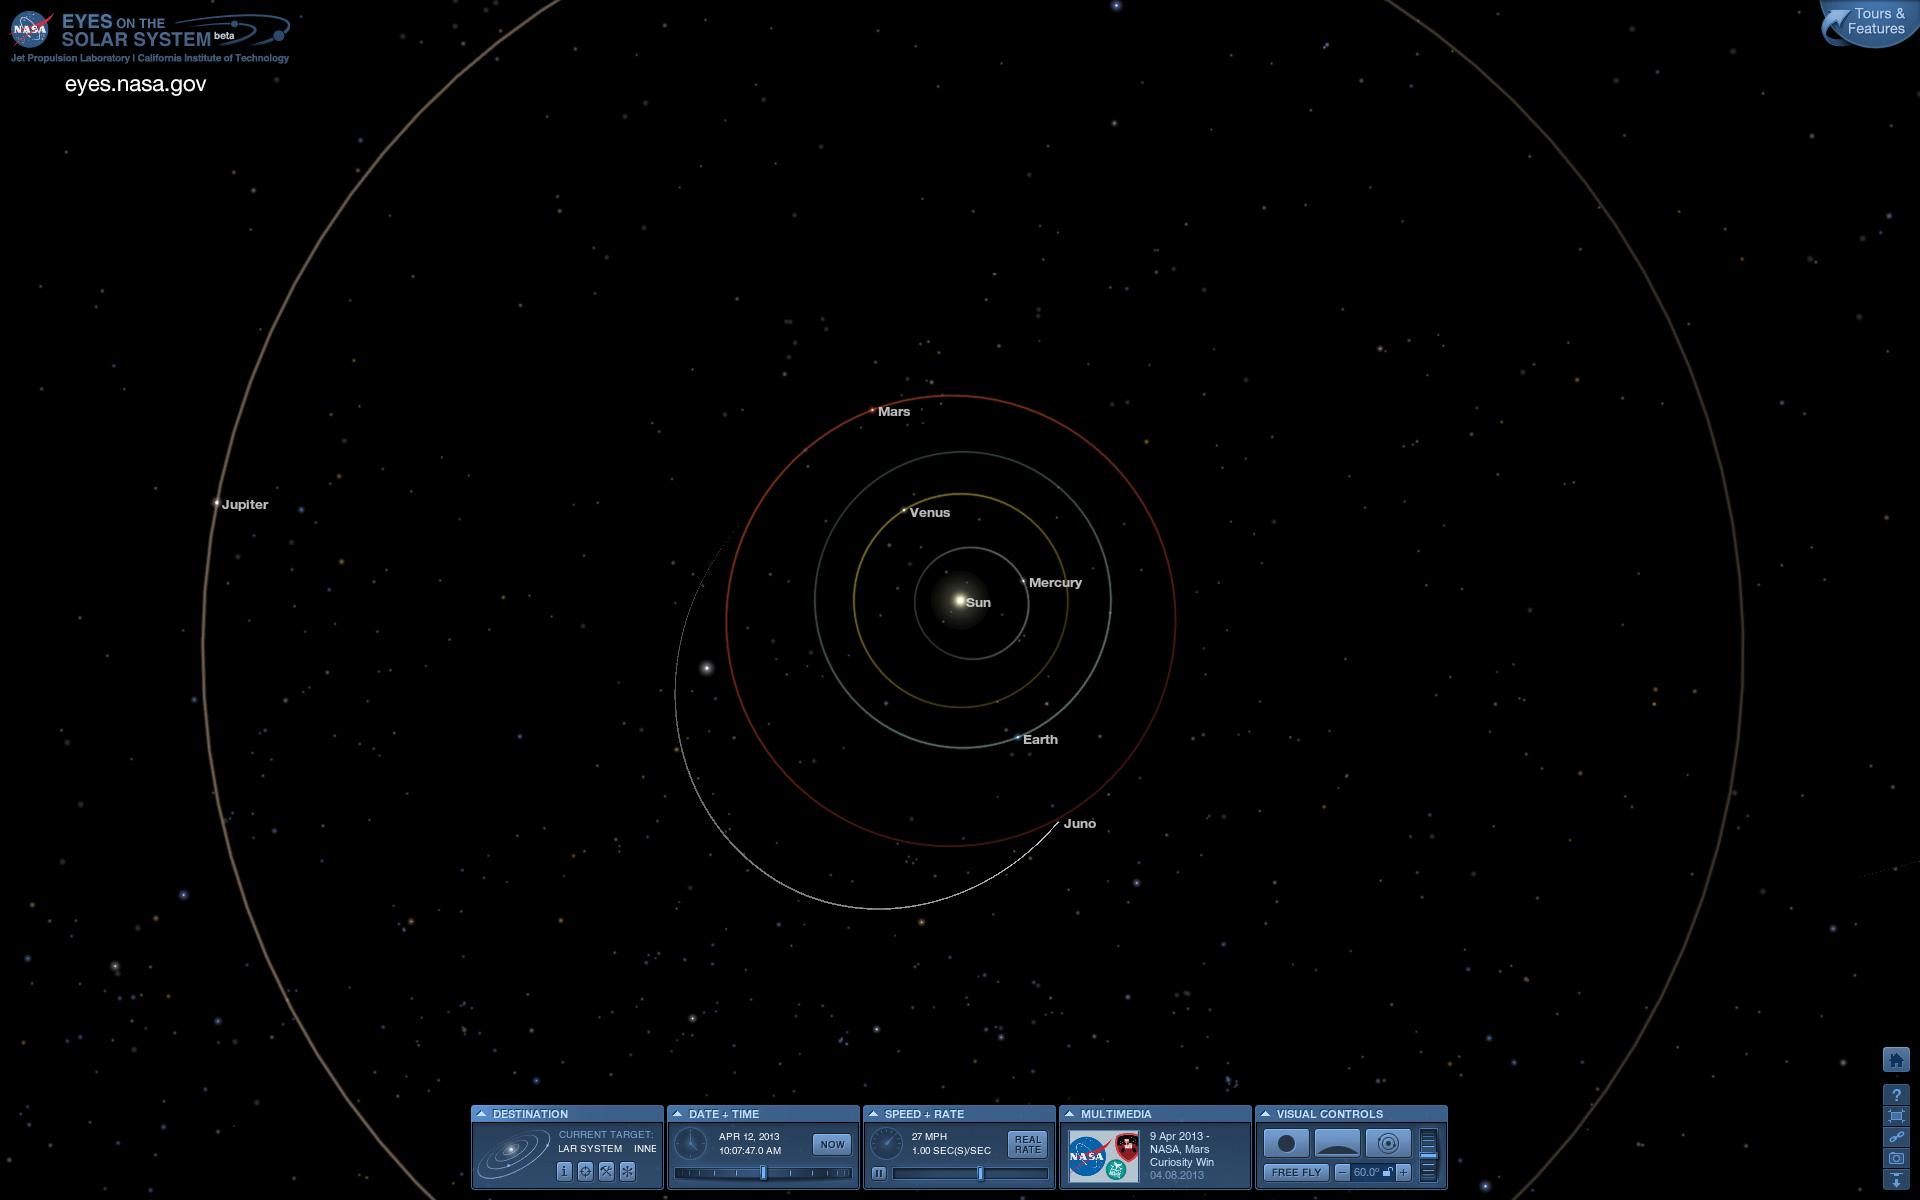 nasa planet simulator - photo #15